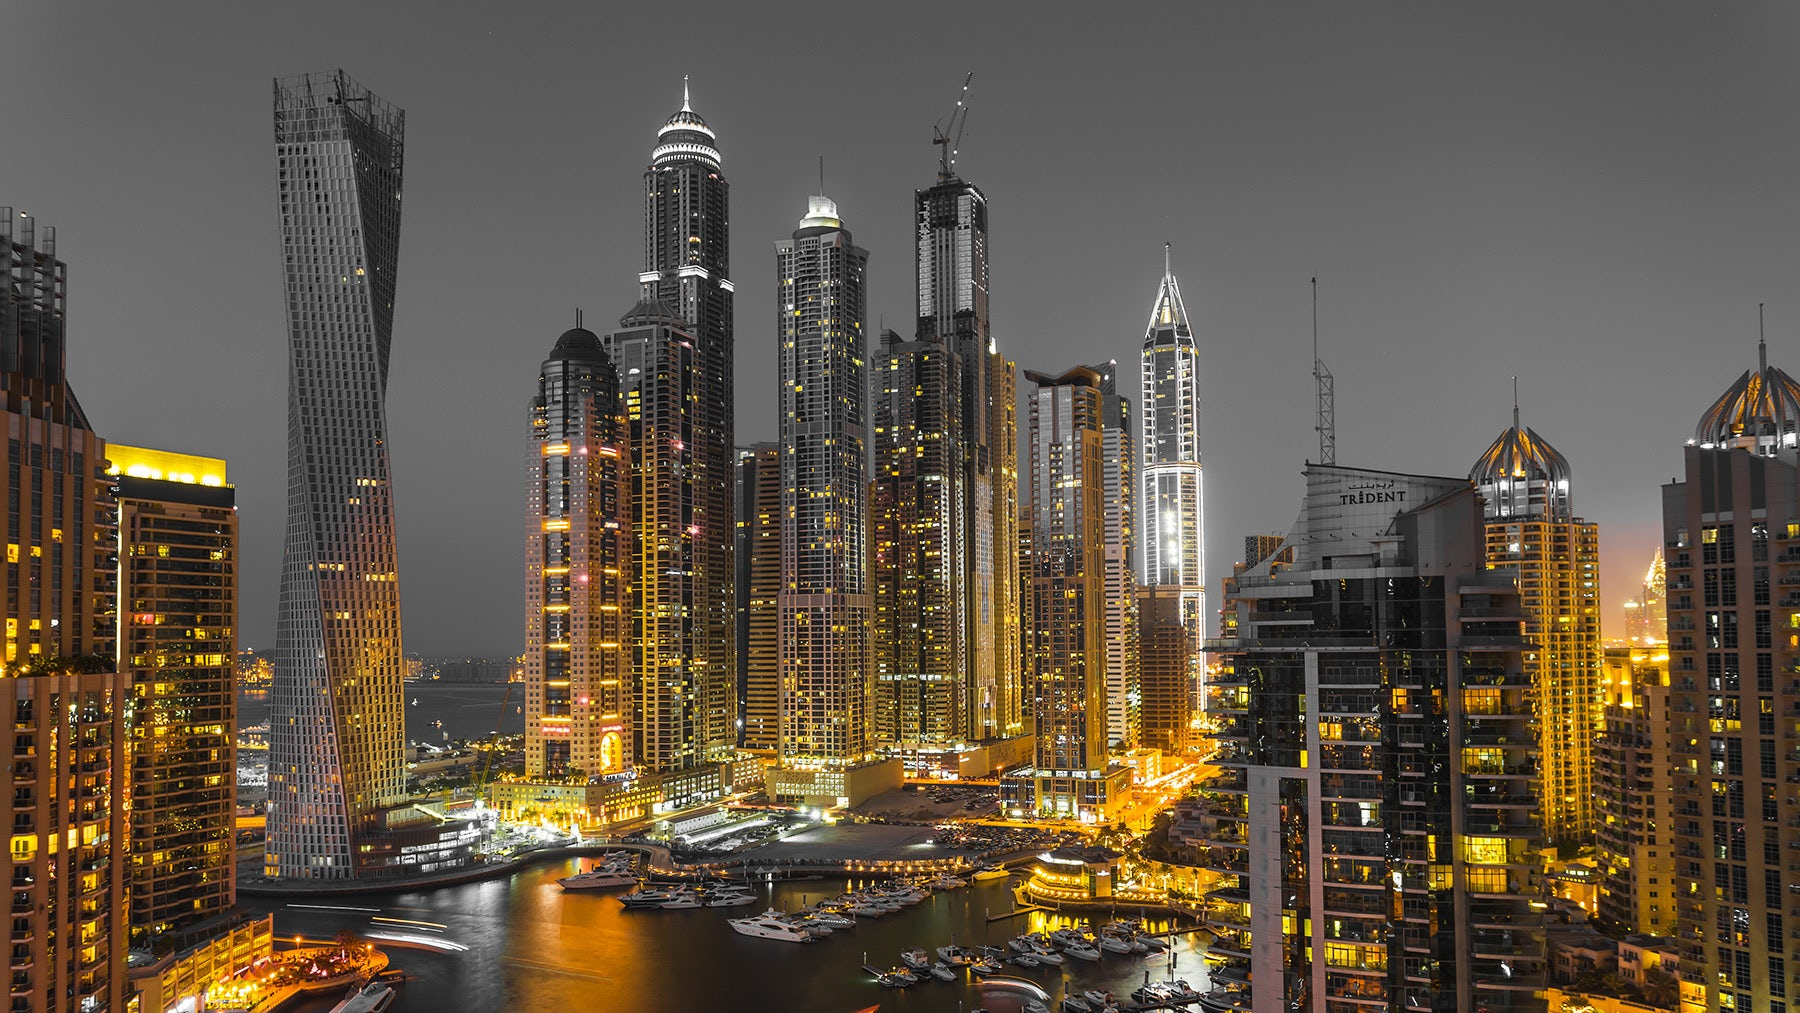 Dubai | Source: Shutterstock